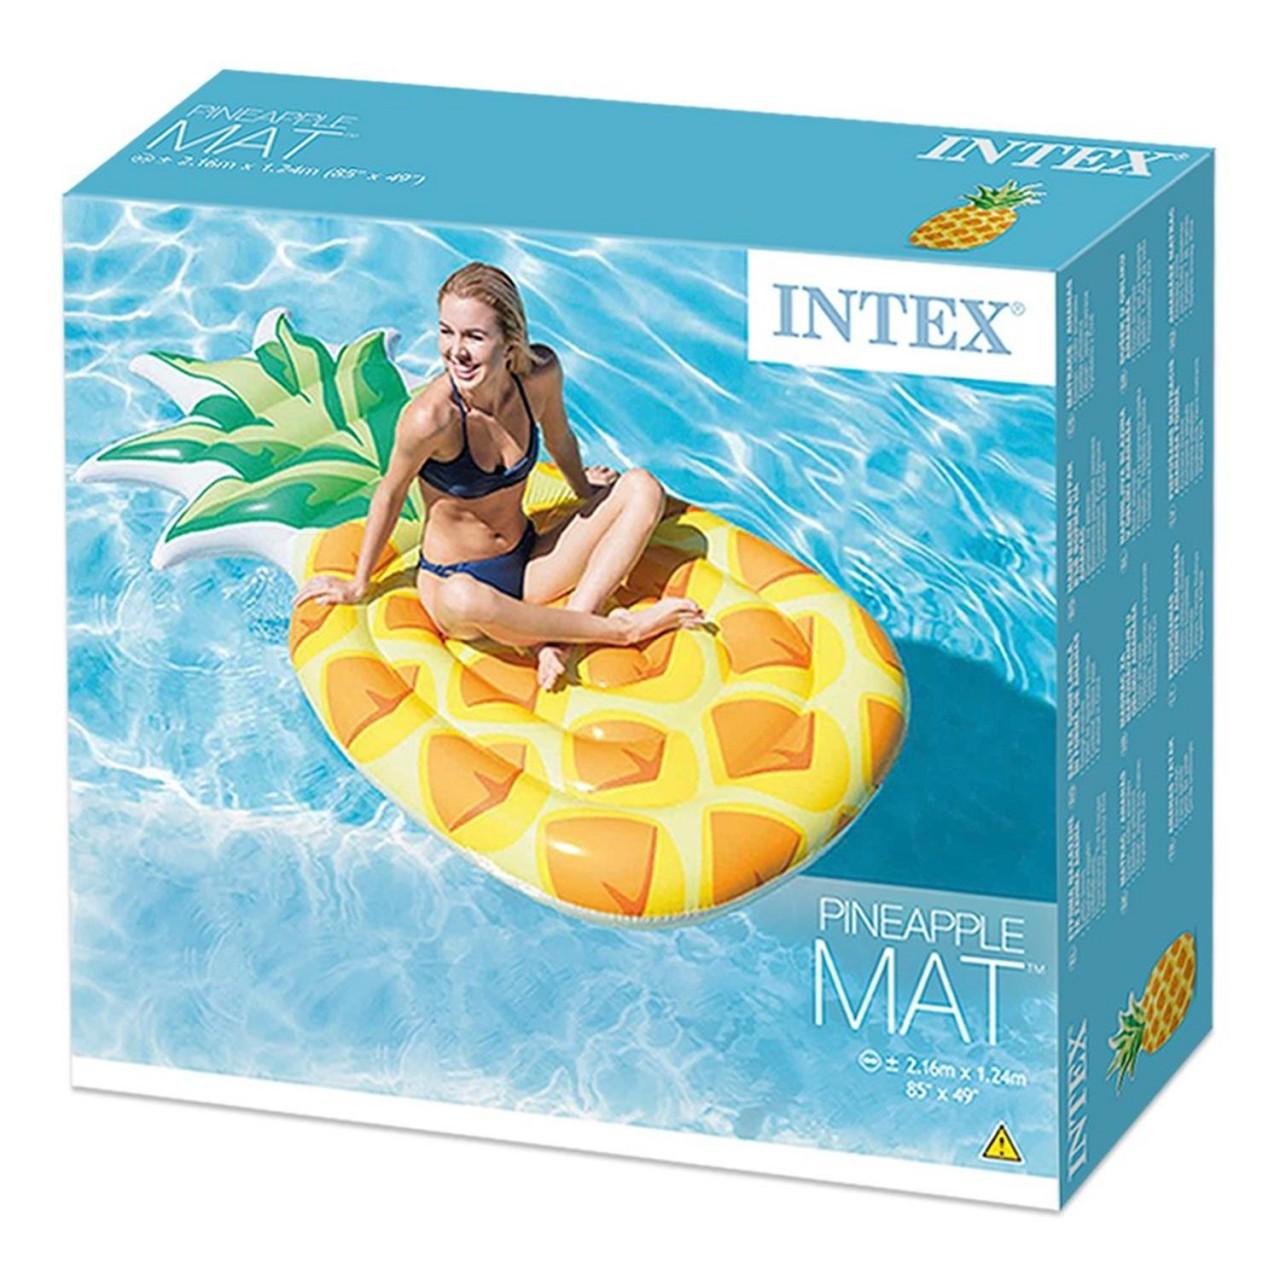 Intex 58761 Luftmatratze Ananas Lounge Matratze Pineapple 216x124 cm Badeinsel